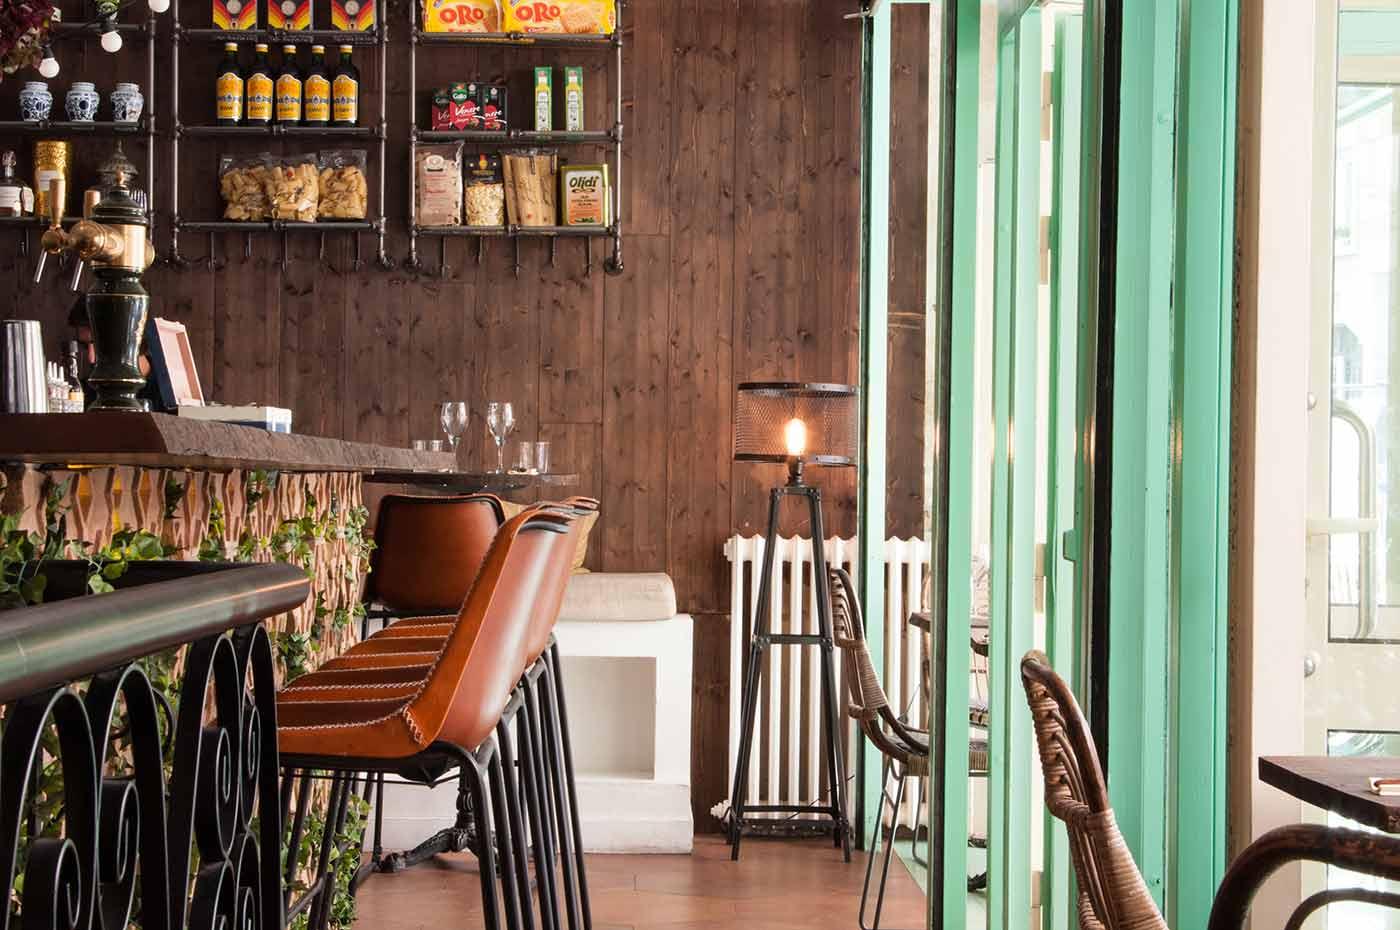 la cicciolina dans le 11e arrondissement o prendre l aperitivo comme en italie nos bonnes. Black Bedroom Furniture Sets. Home Design Ideas